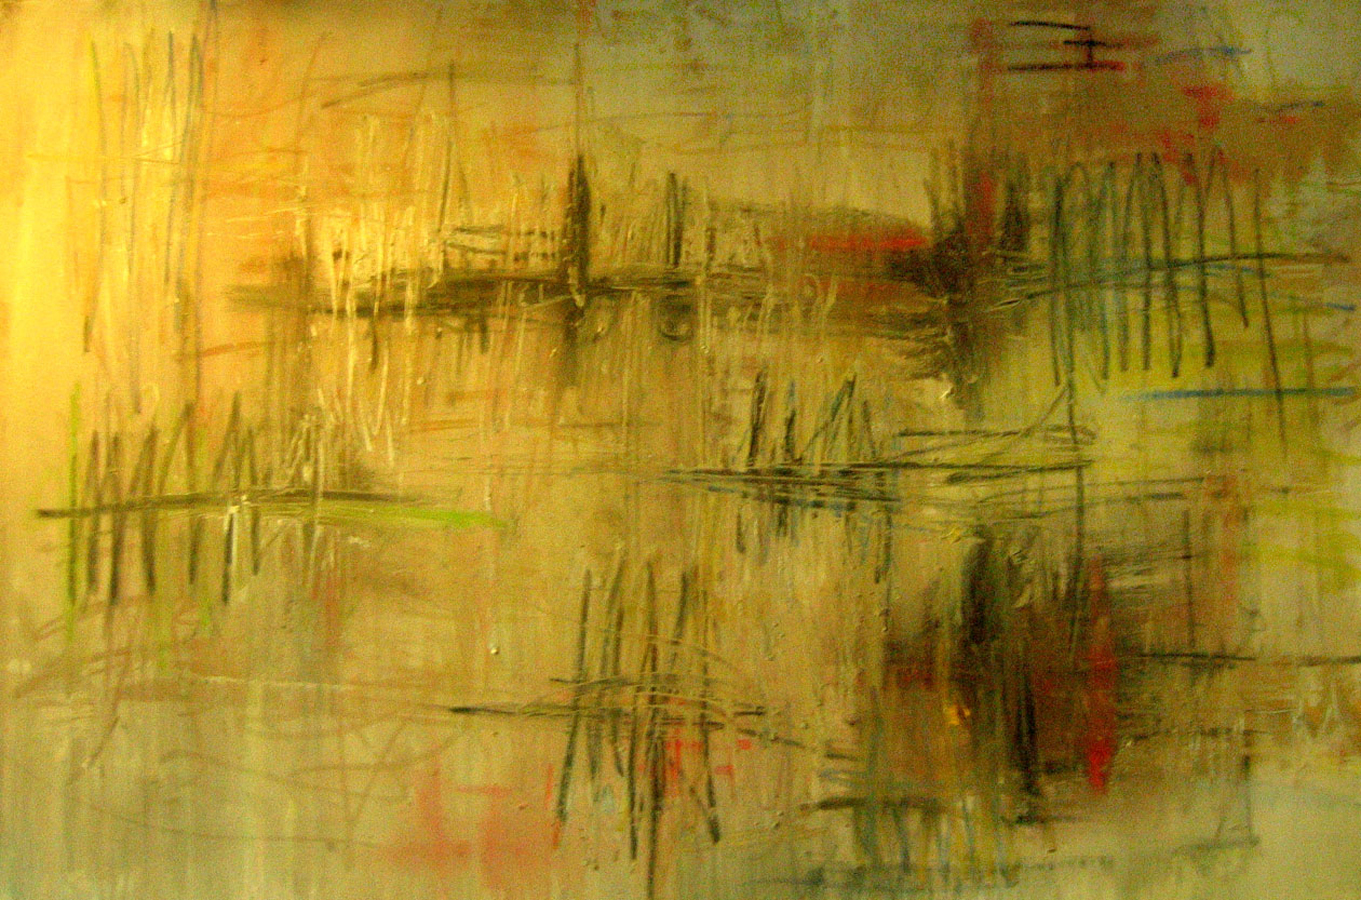 fiive, 2006, 24x30